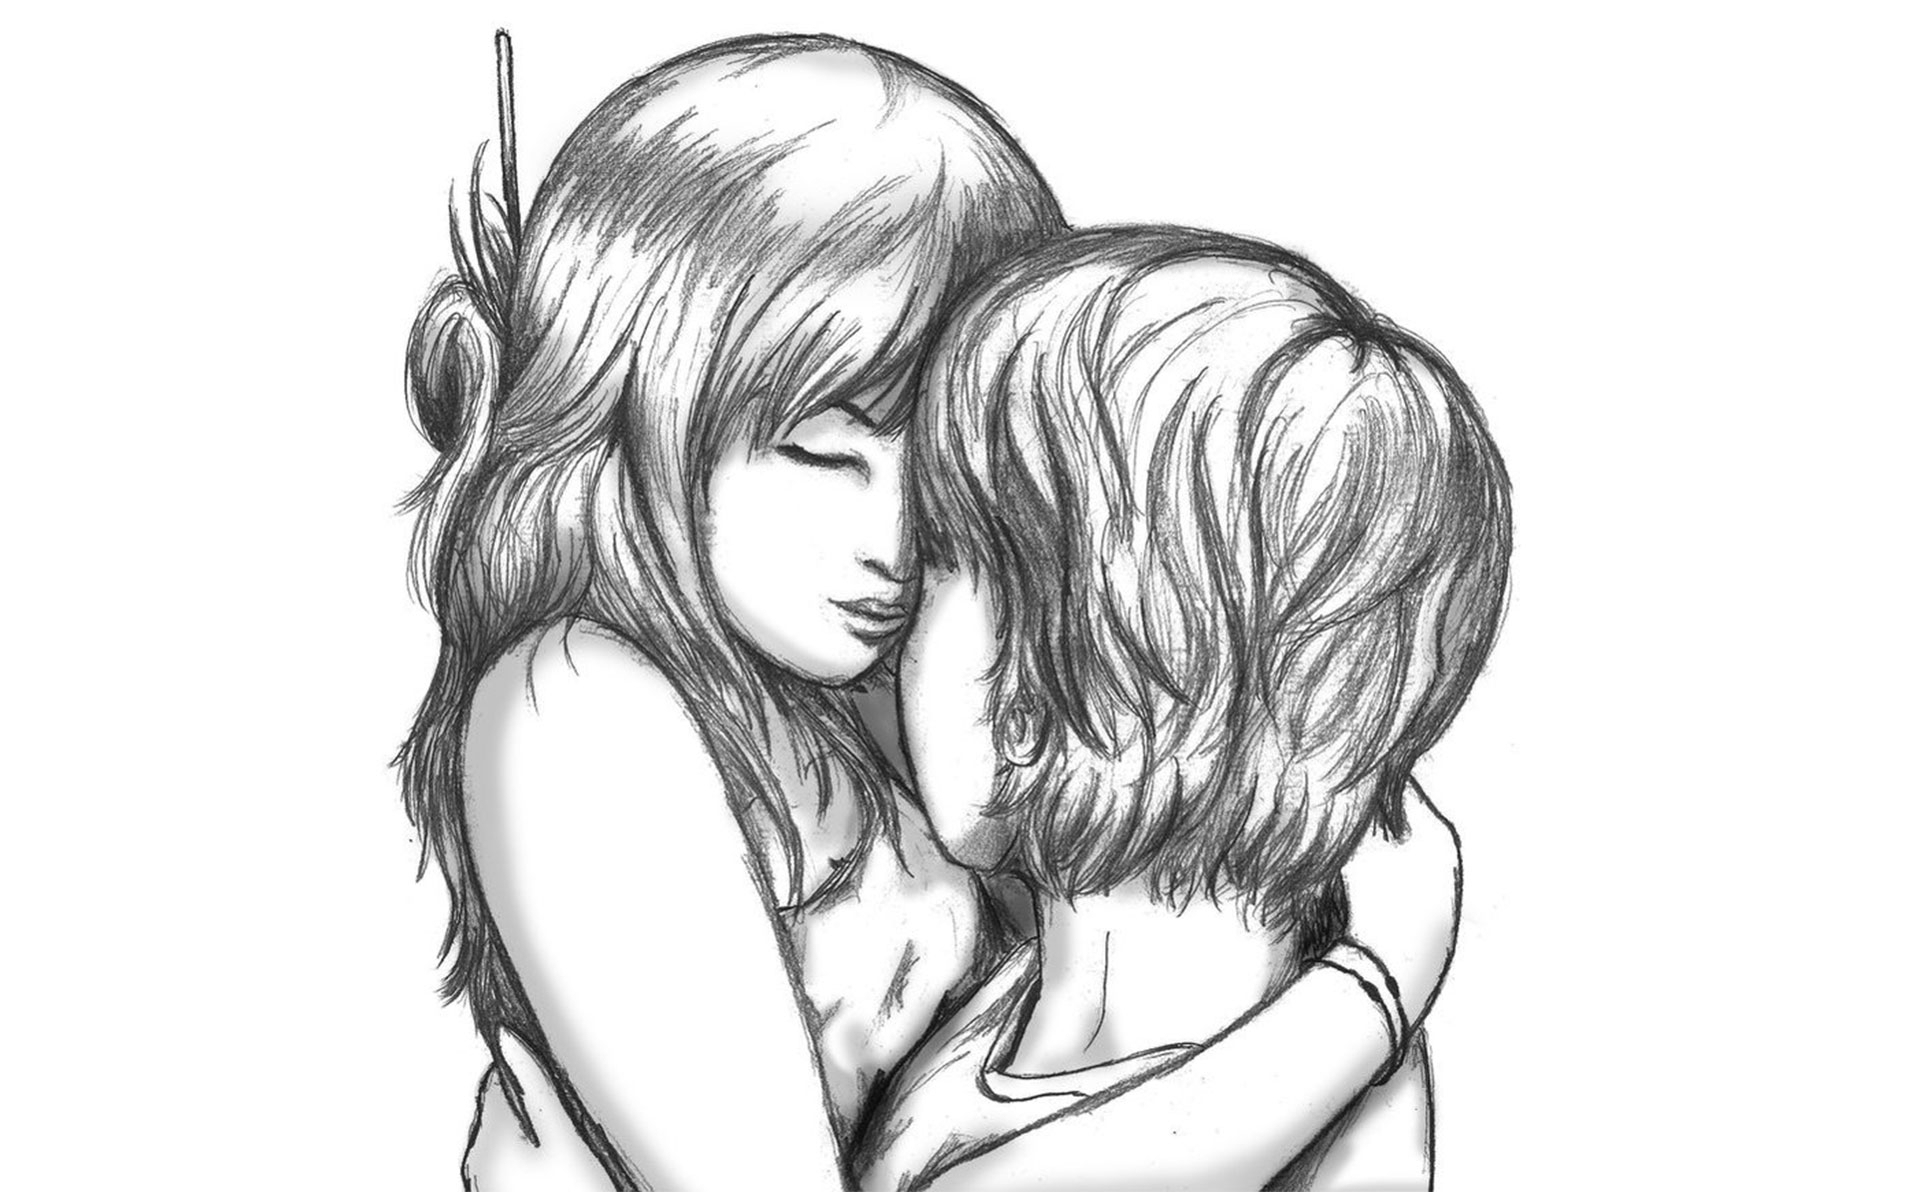 1920x1200 Romantic Art Sketch Romance Art Pencil Drawings Easy